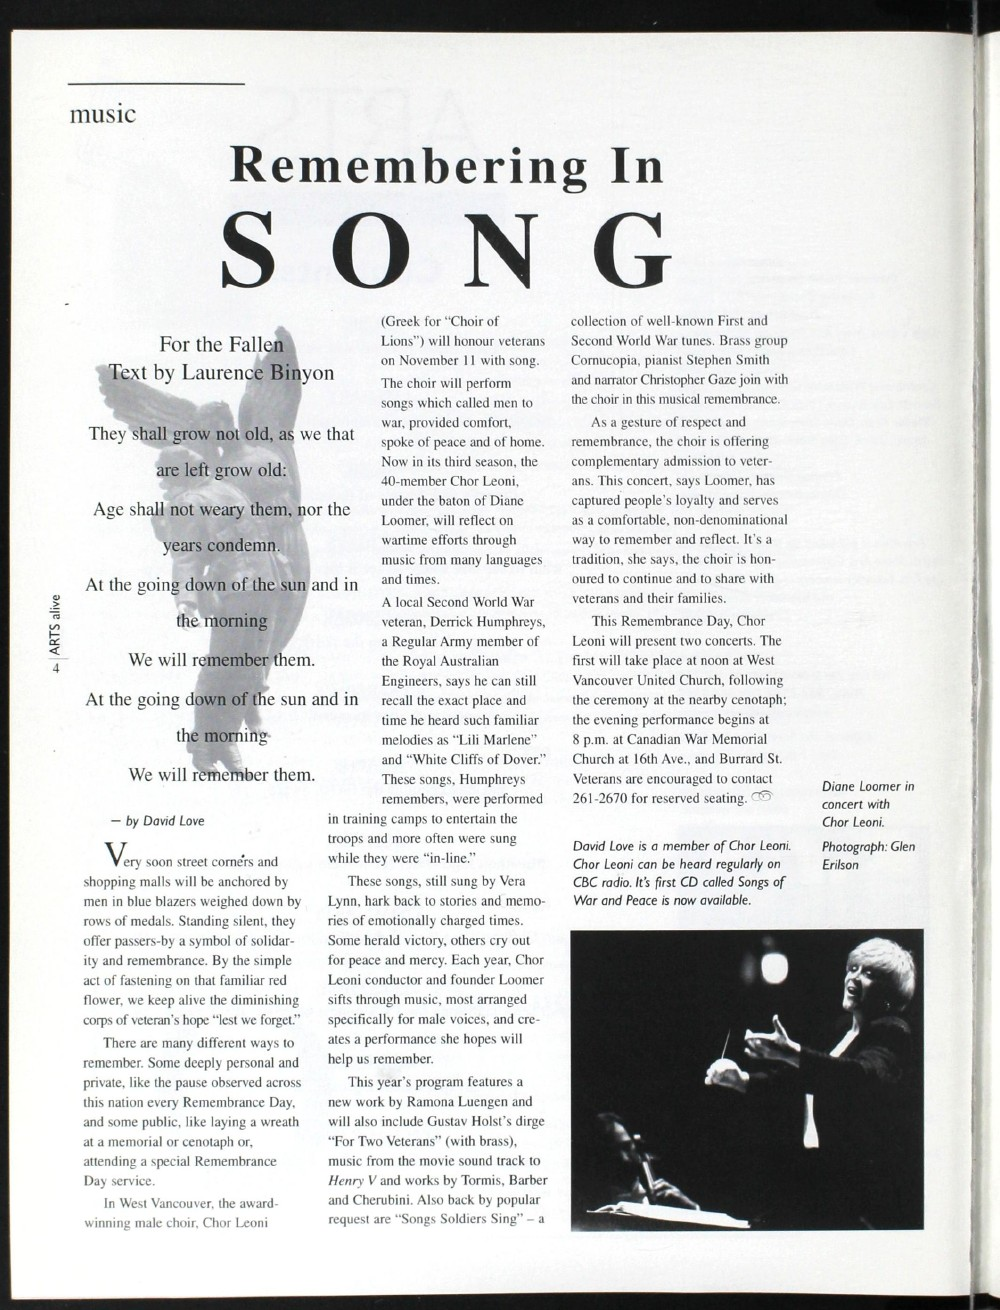 Arts Alive, November/December 1995